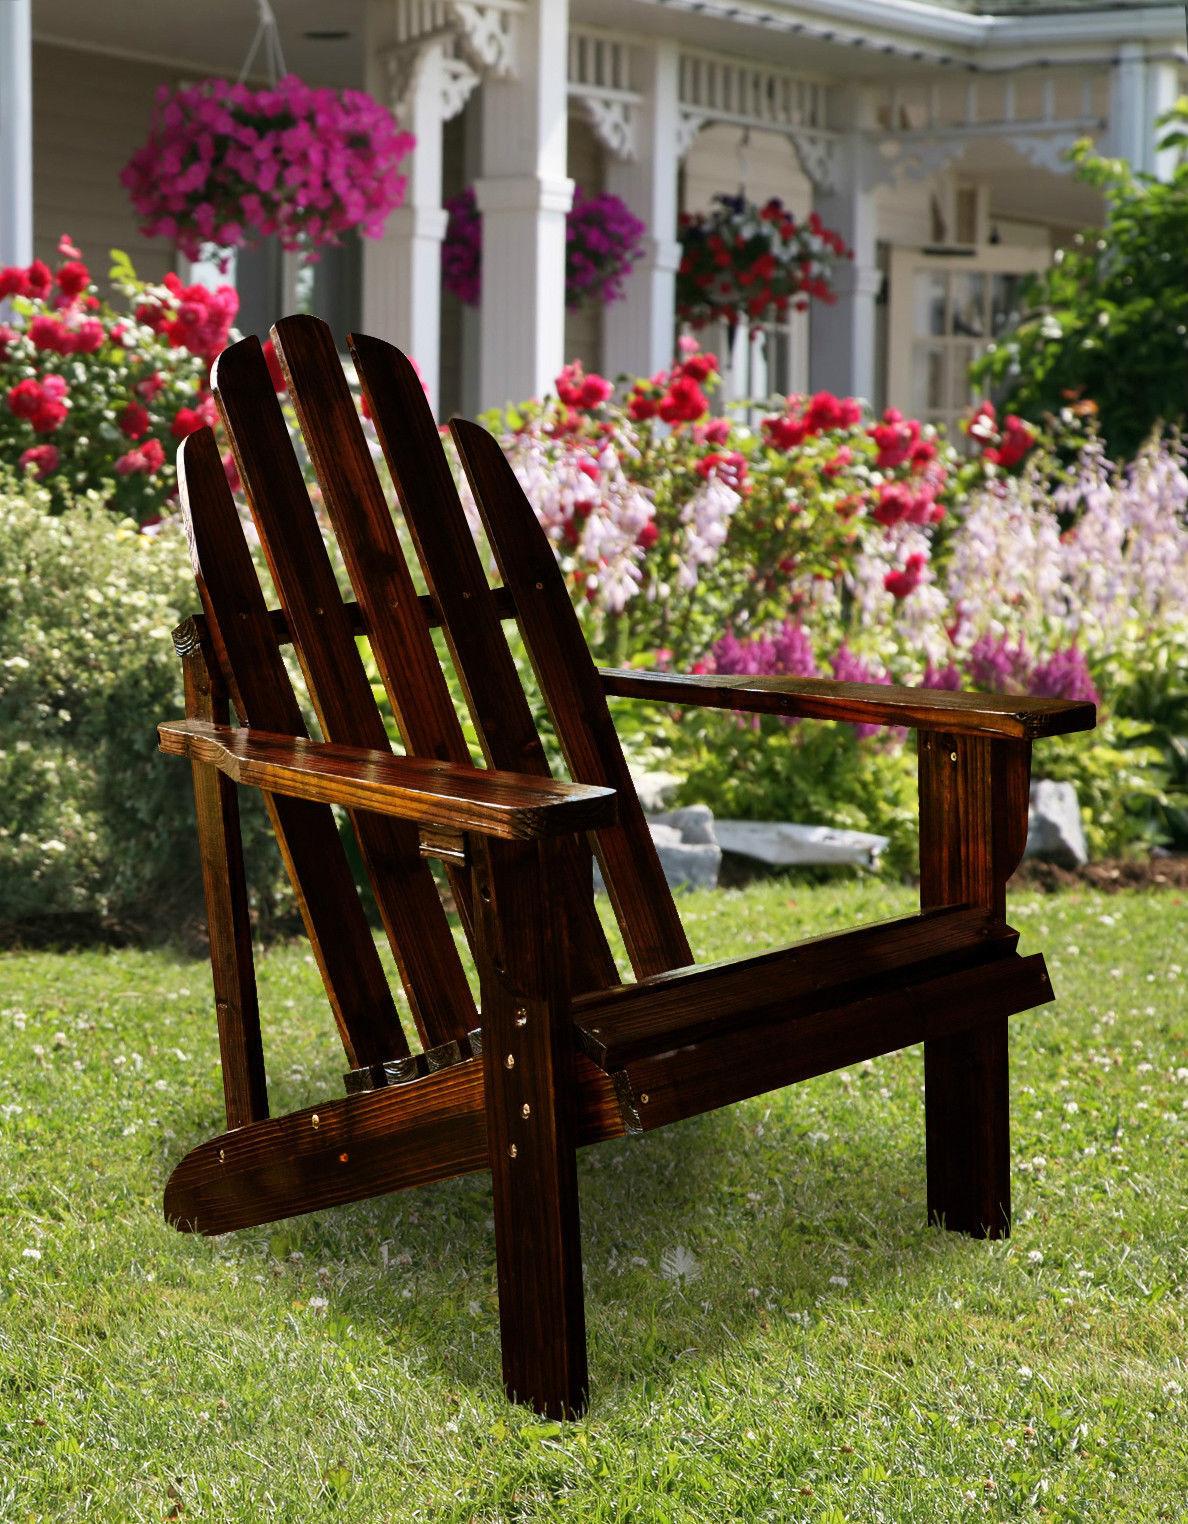 Catalina Cedar Adirondack Chair Shine Company 6 Colors Patio Deck